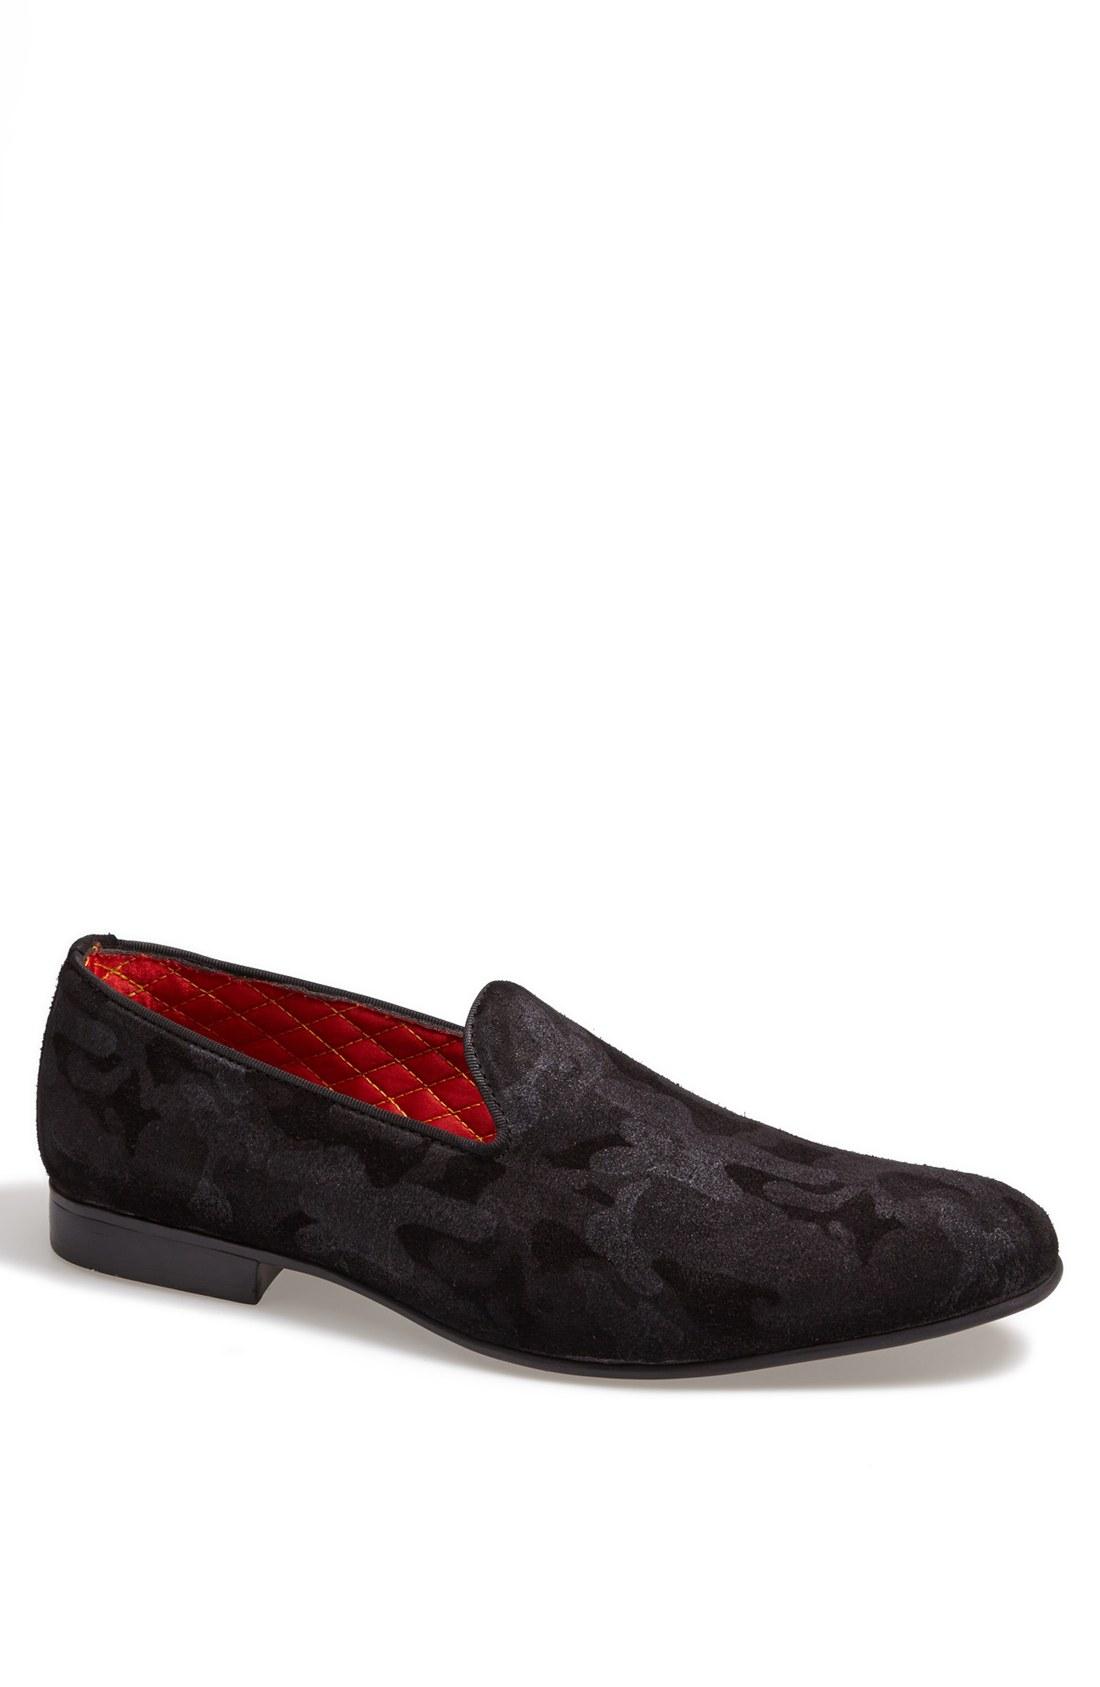 Aldo Mens Shoes Black Fashion Guide